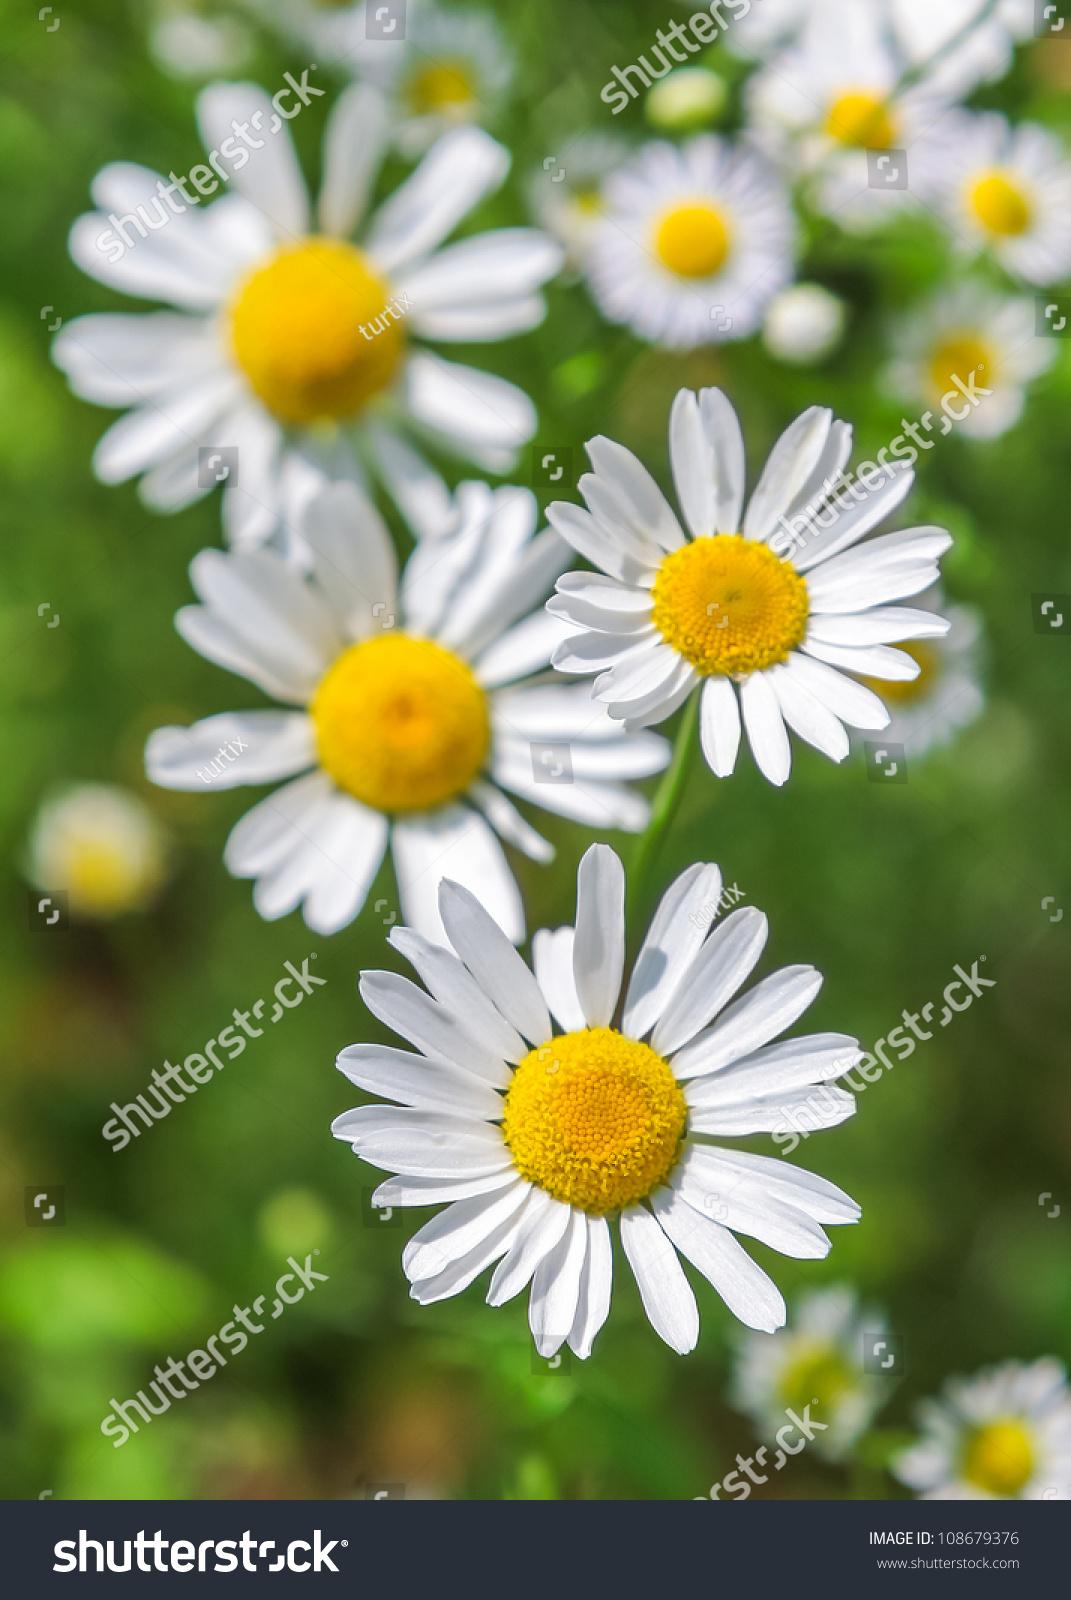 Beautiful daisy flowers stock photo royalty free 108679376 beautiful daisy flowers izmirmasajfo Choice Image